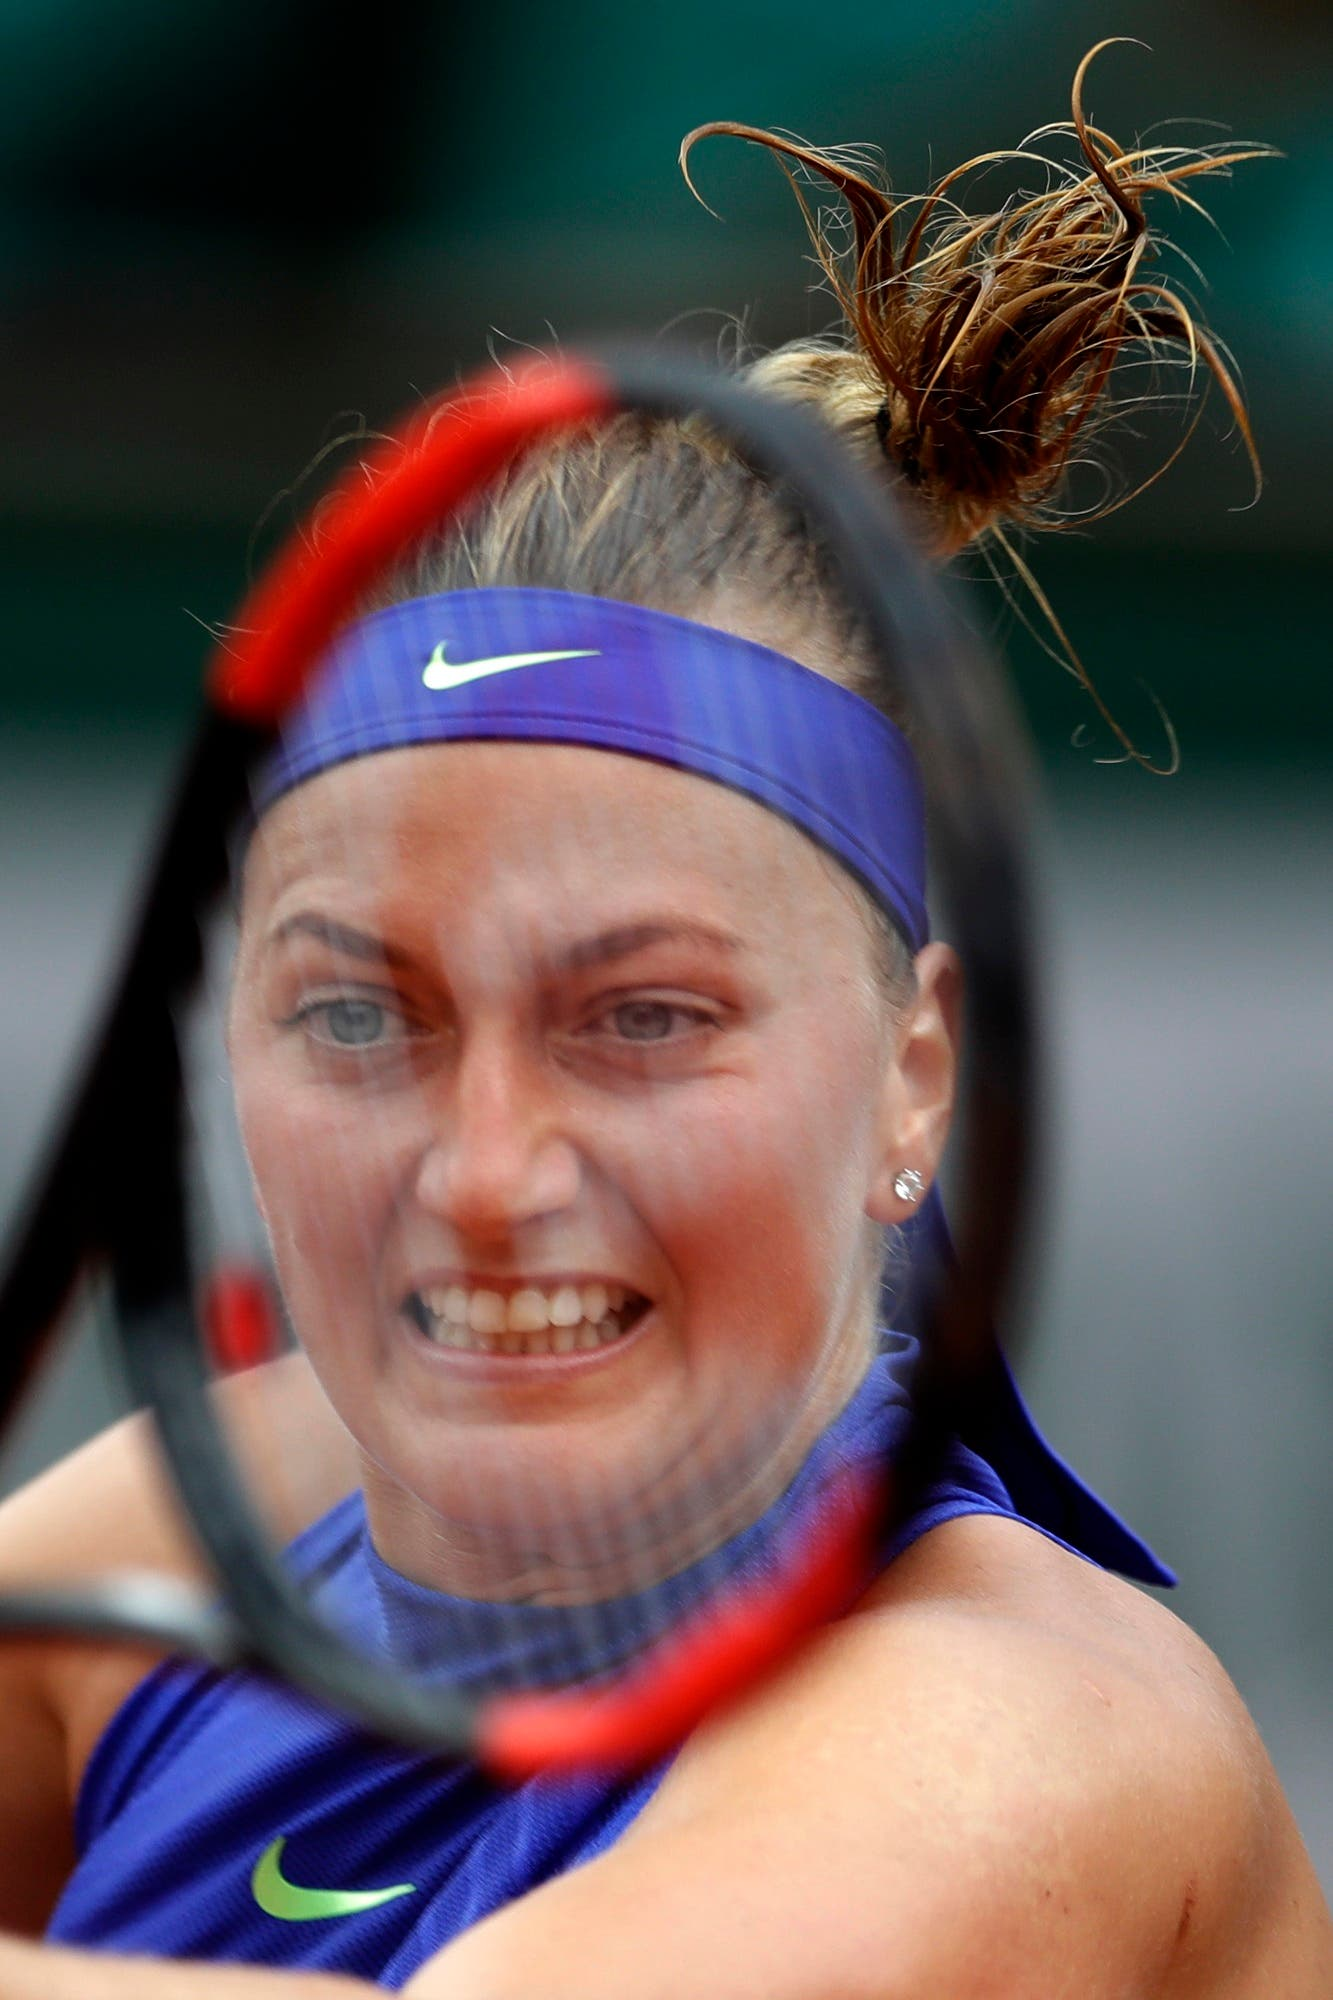 AP photo of the tennis player, Kvitova